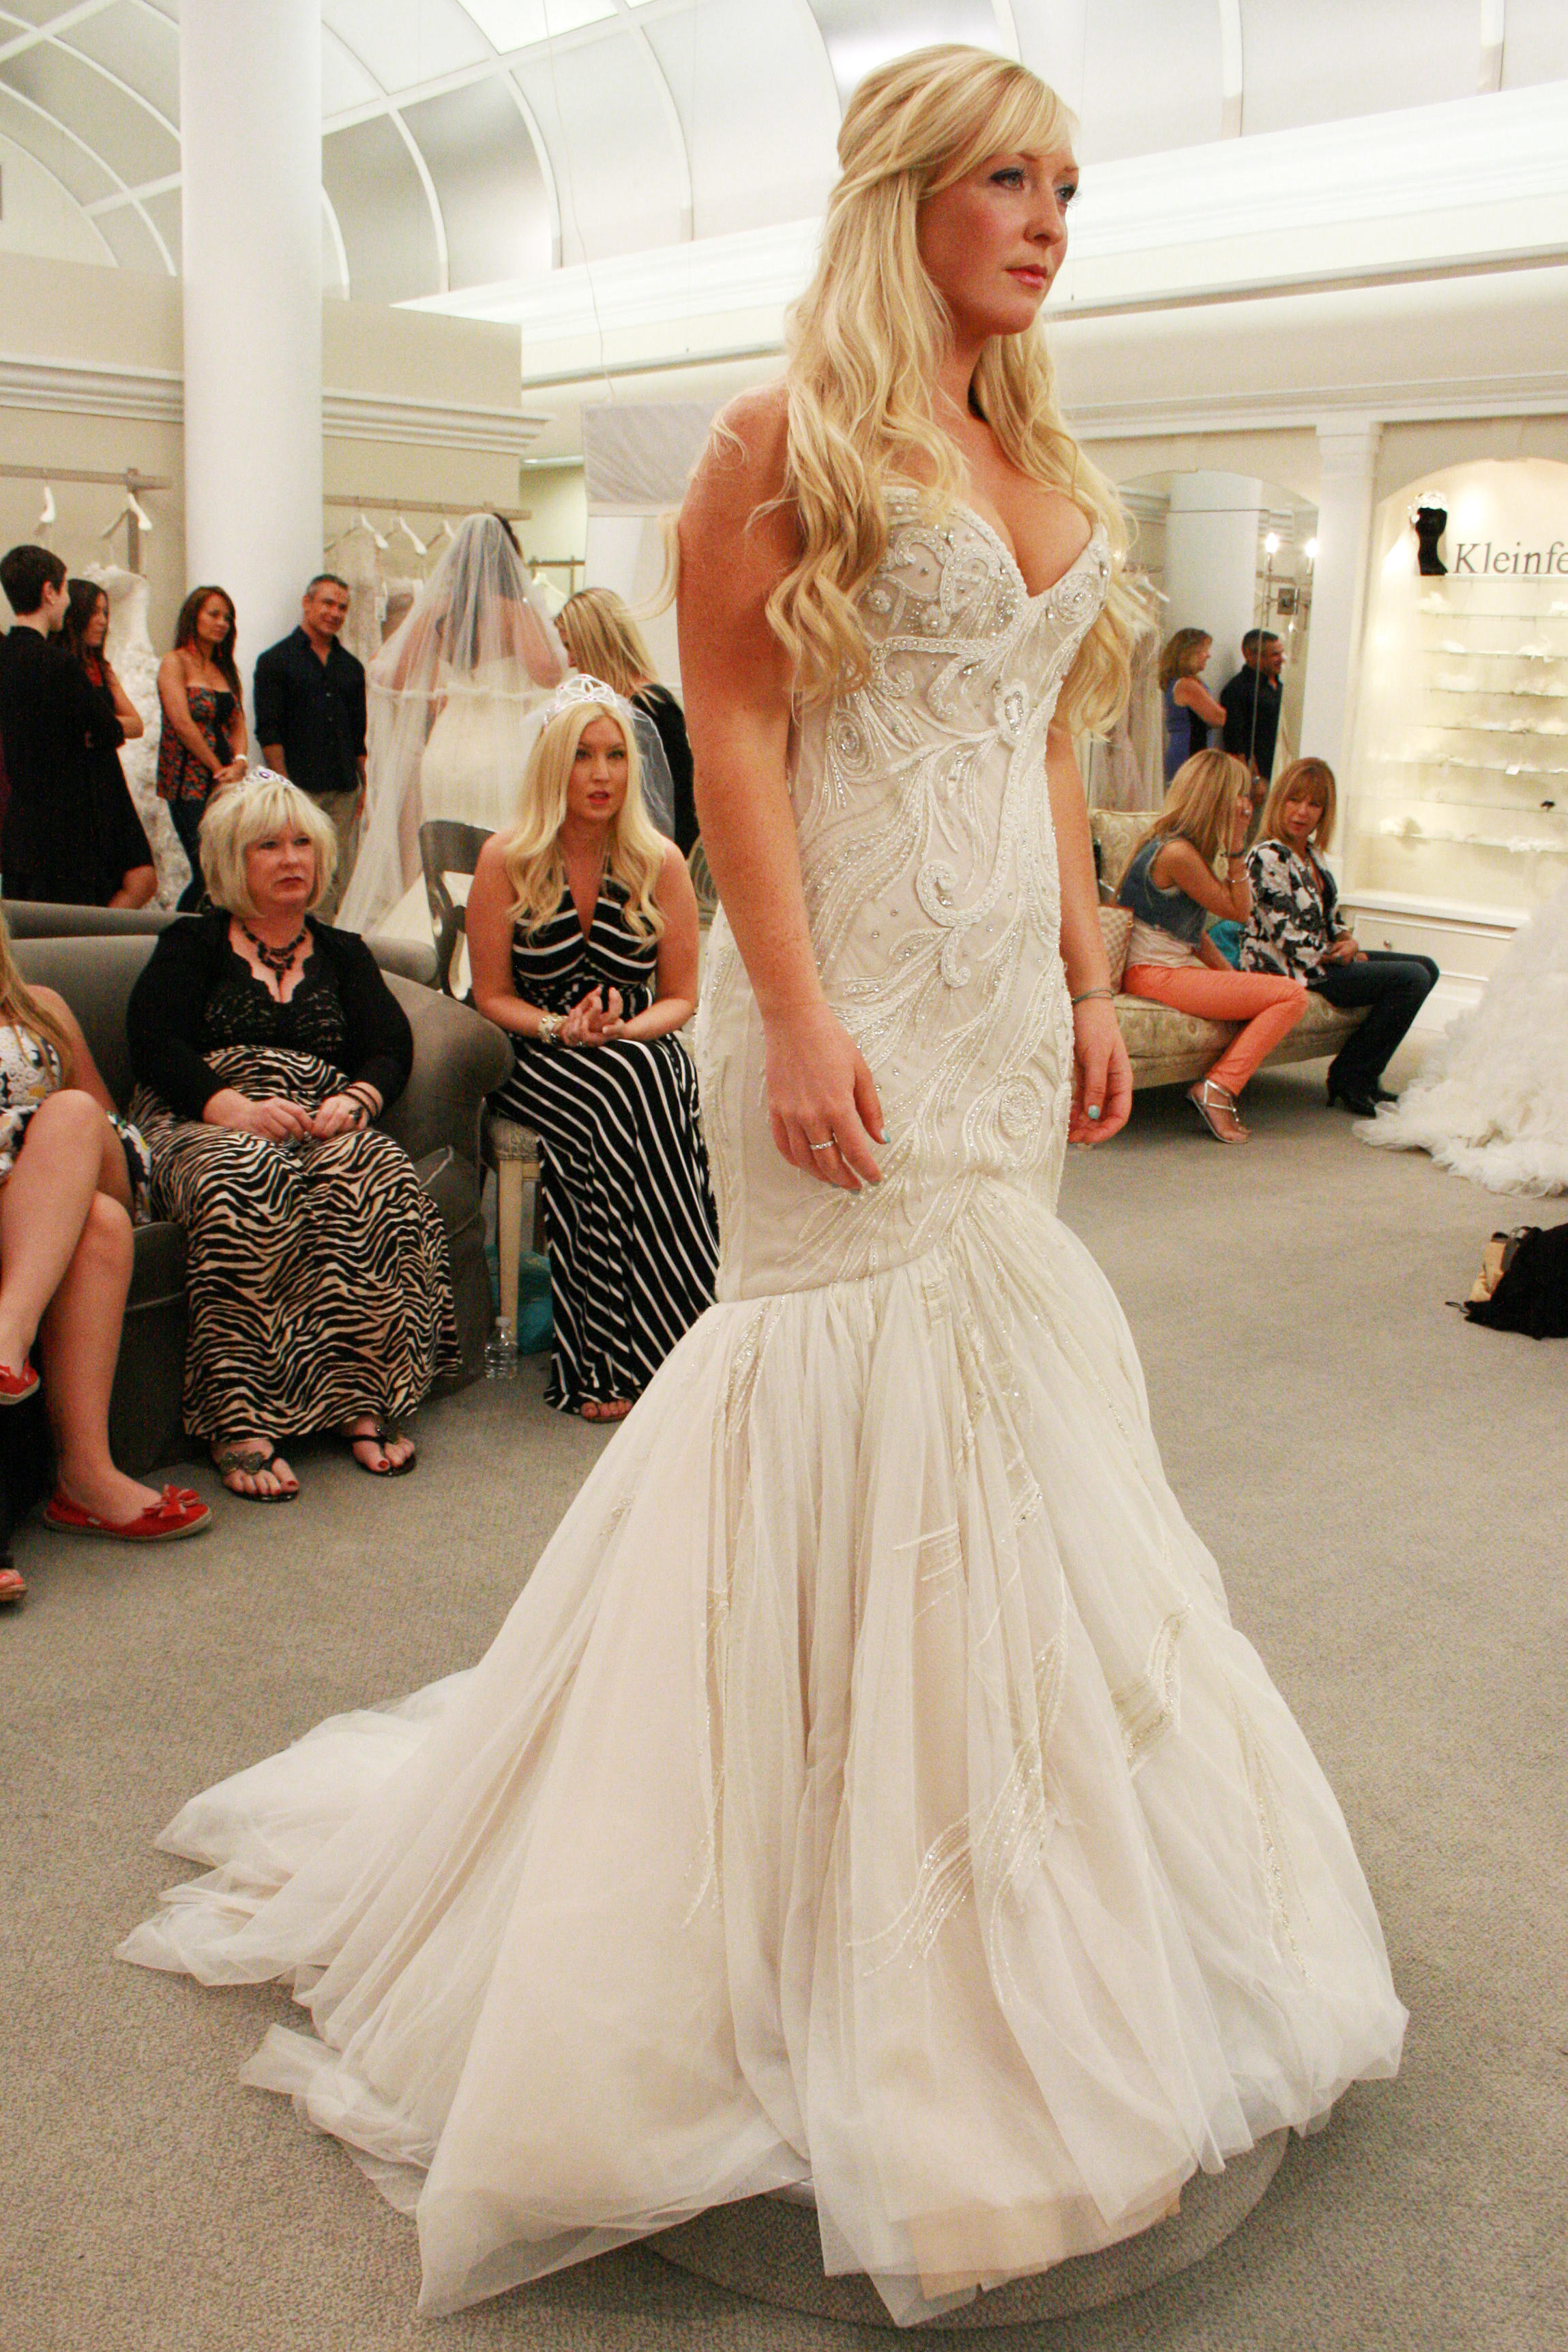 Season 11 Featured Wedding Dresses Part 7